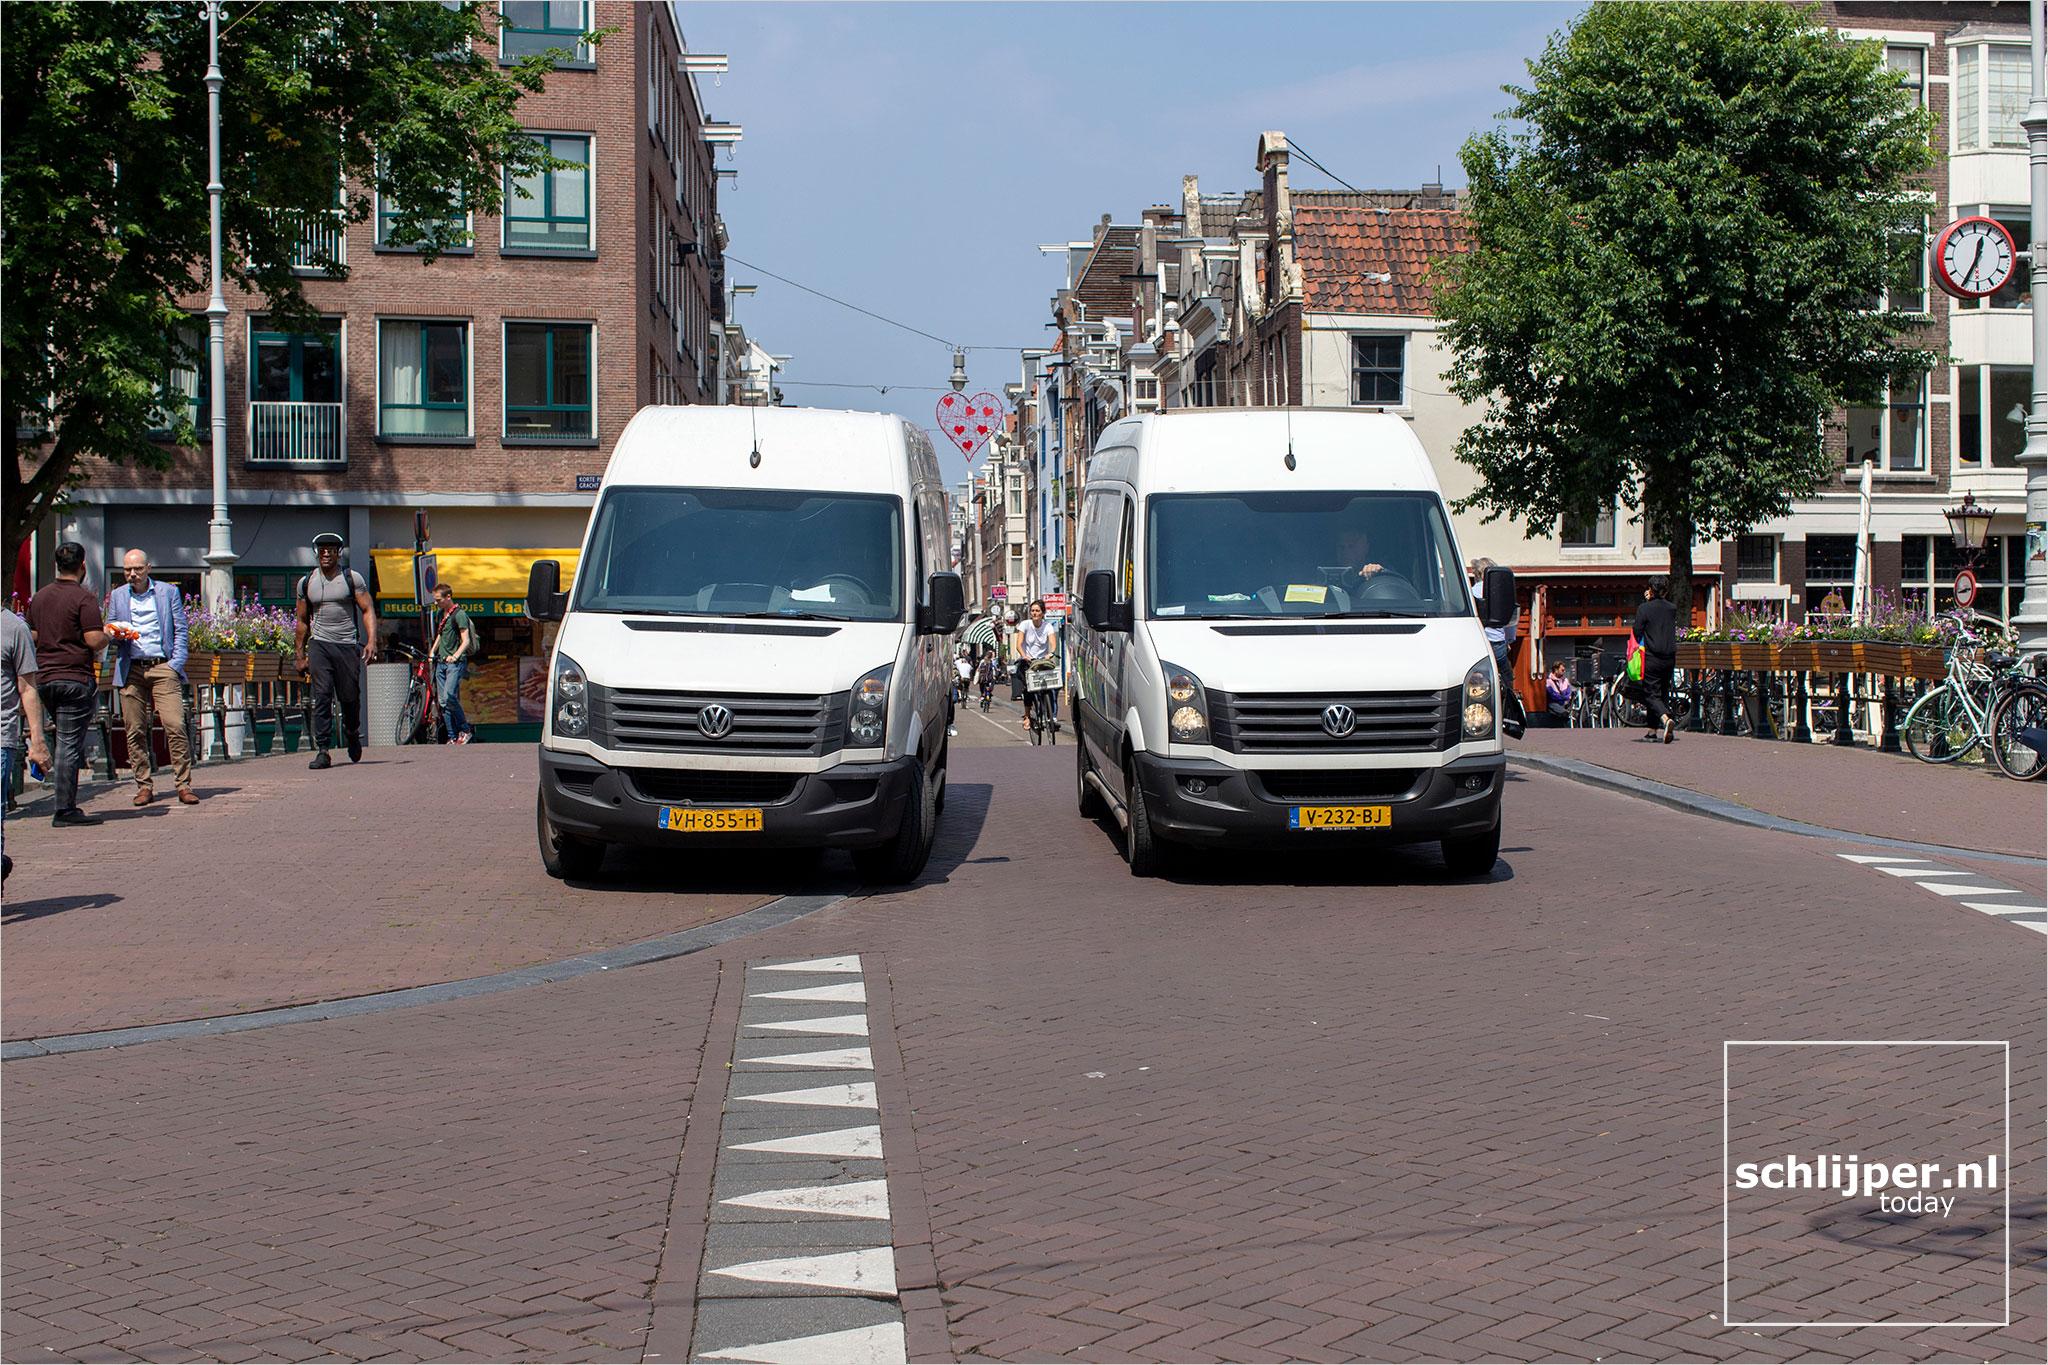 Nederland, Amsterdam, 19 juni 2020